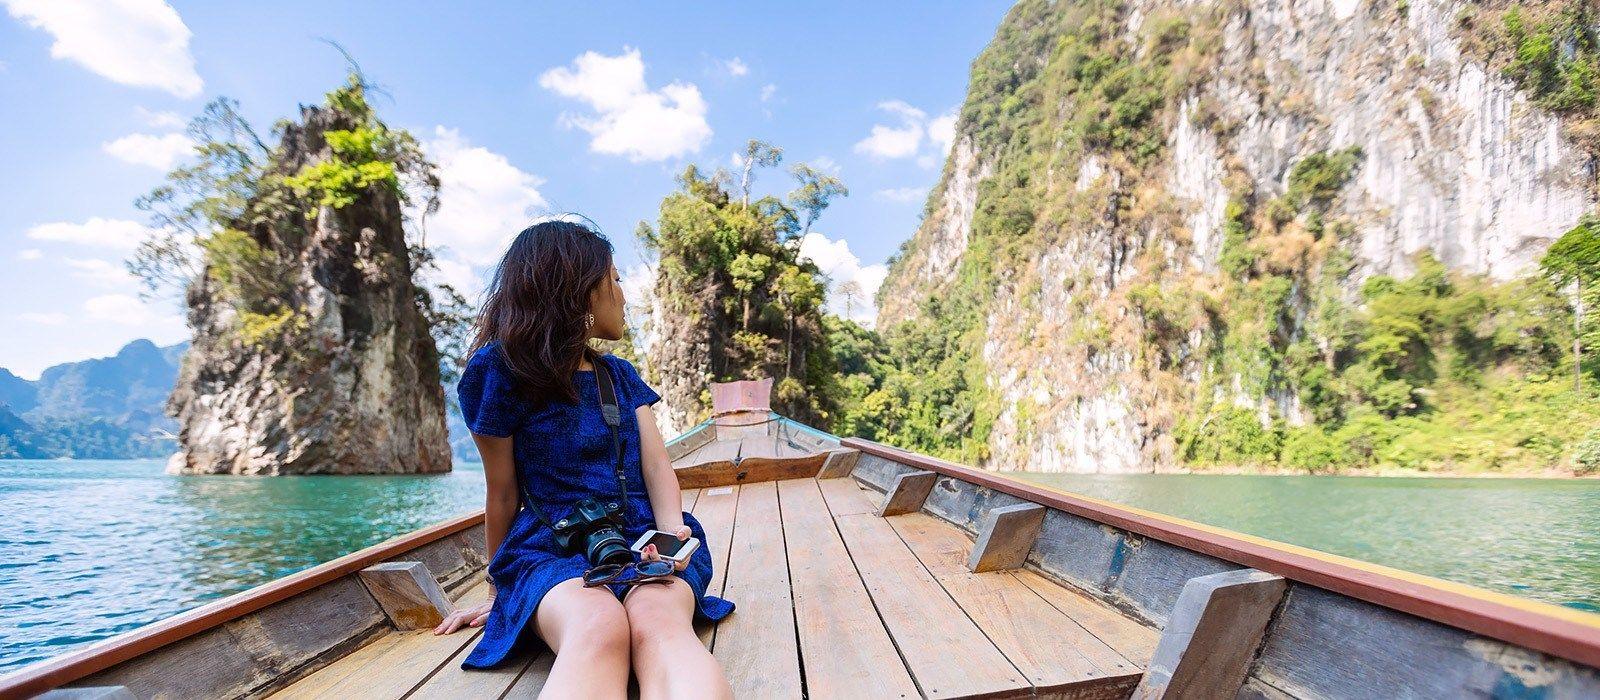 Destination Khao Sok Thailand